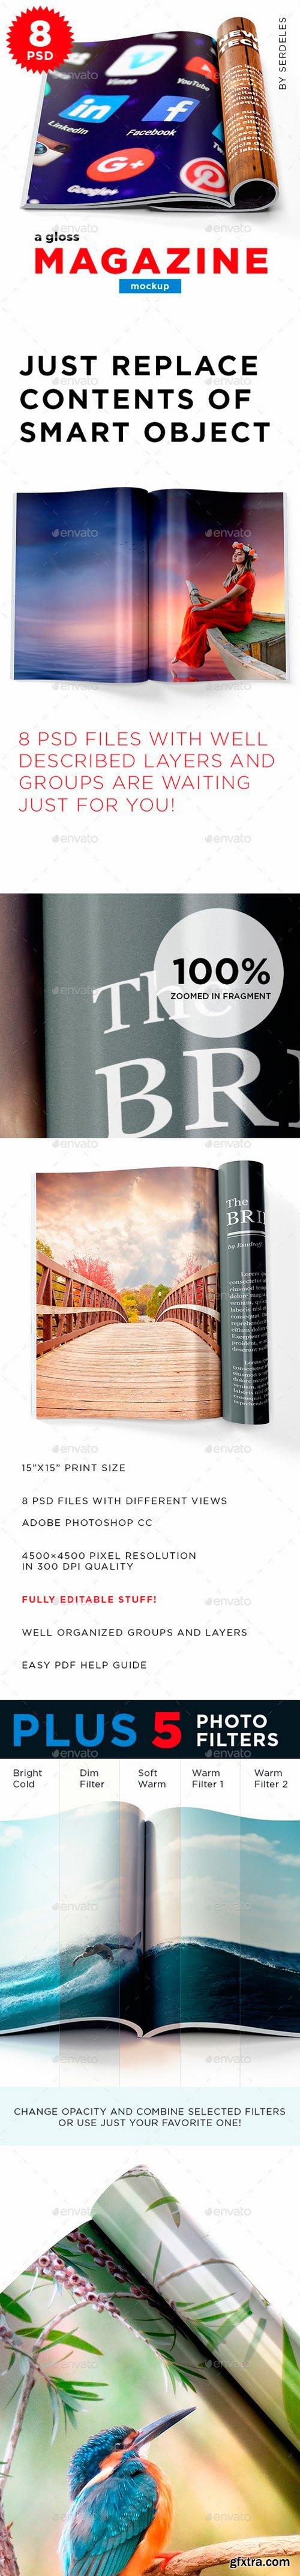 Graphicriver - 22043609 Magazine Mockup